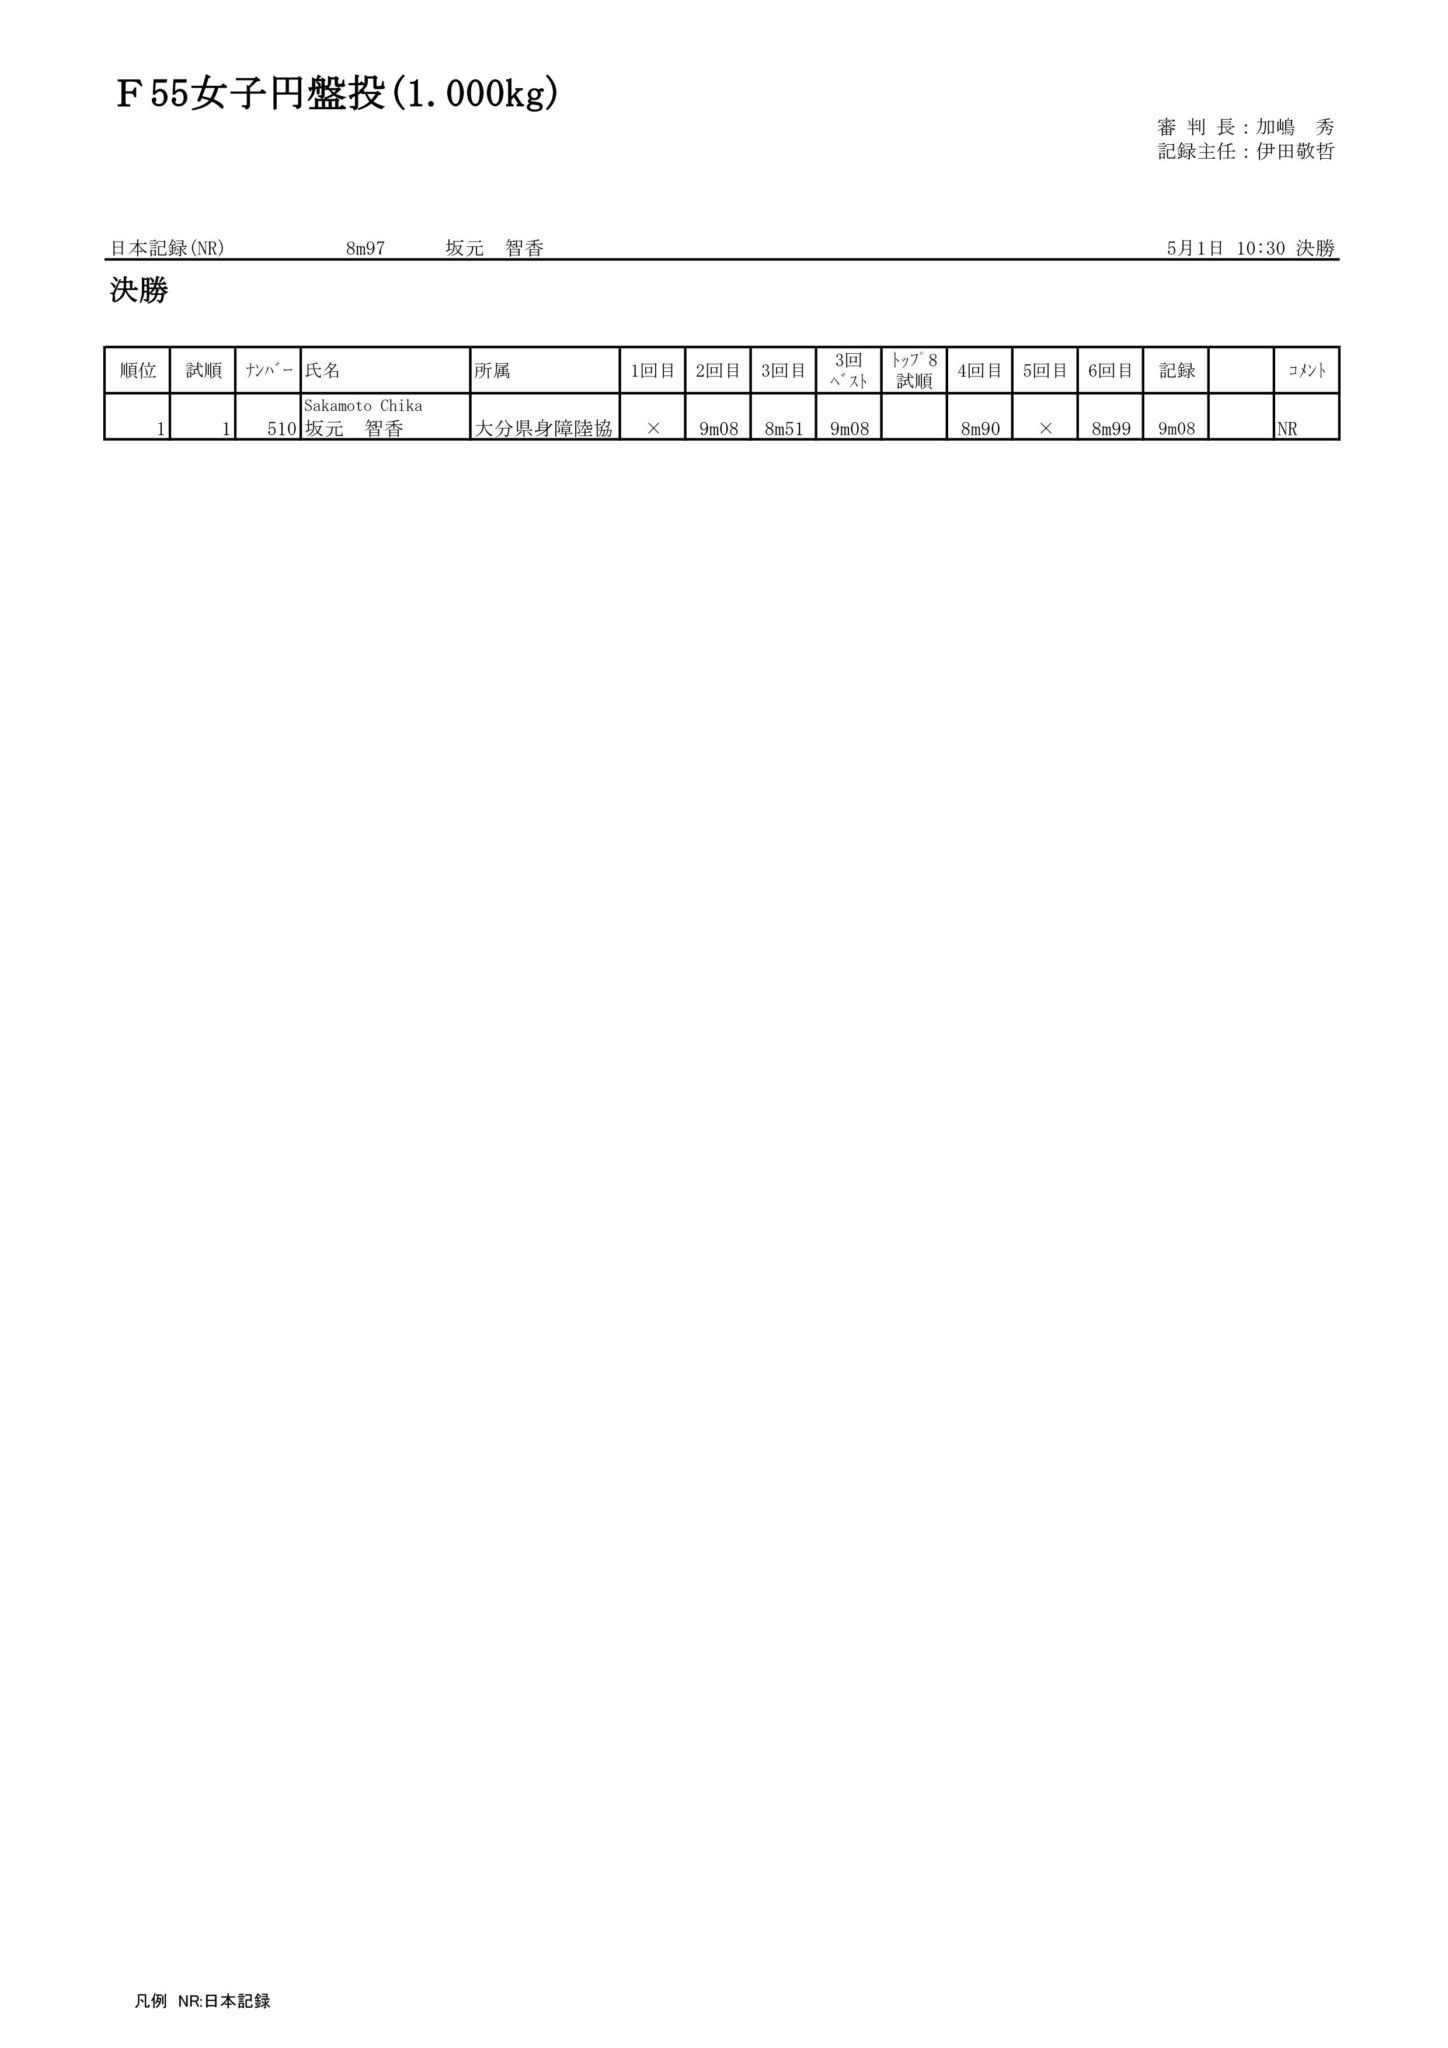 26F55女子円盤投(1.000kg)_01